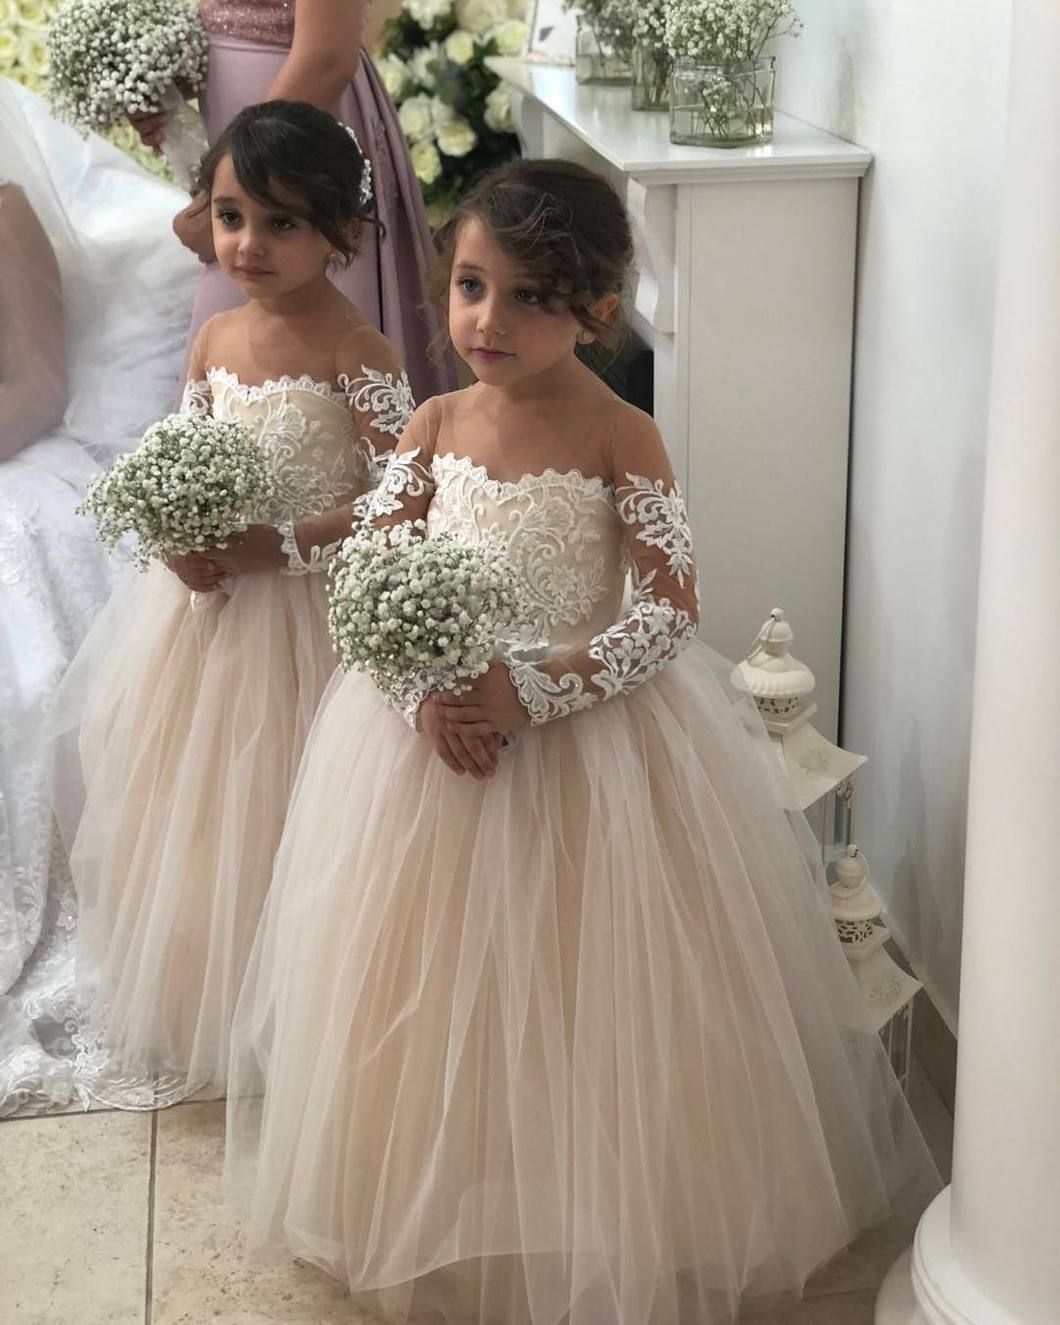 Beautiful Tulle Ball Gown Flower Girl Dresses for Weddings